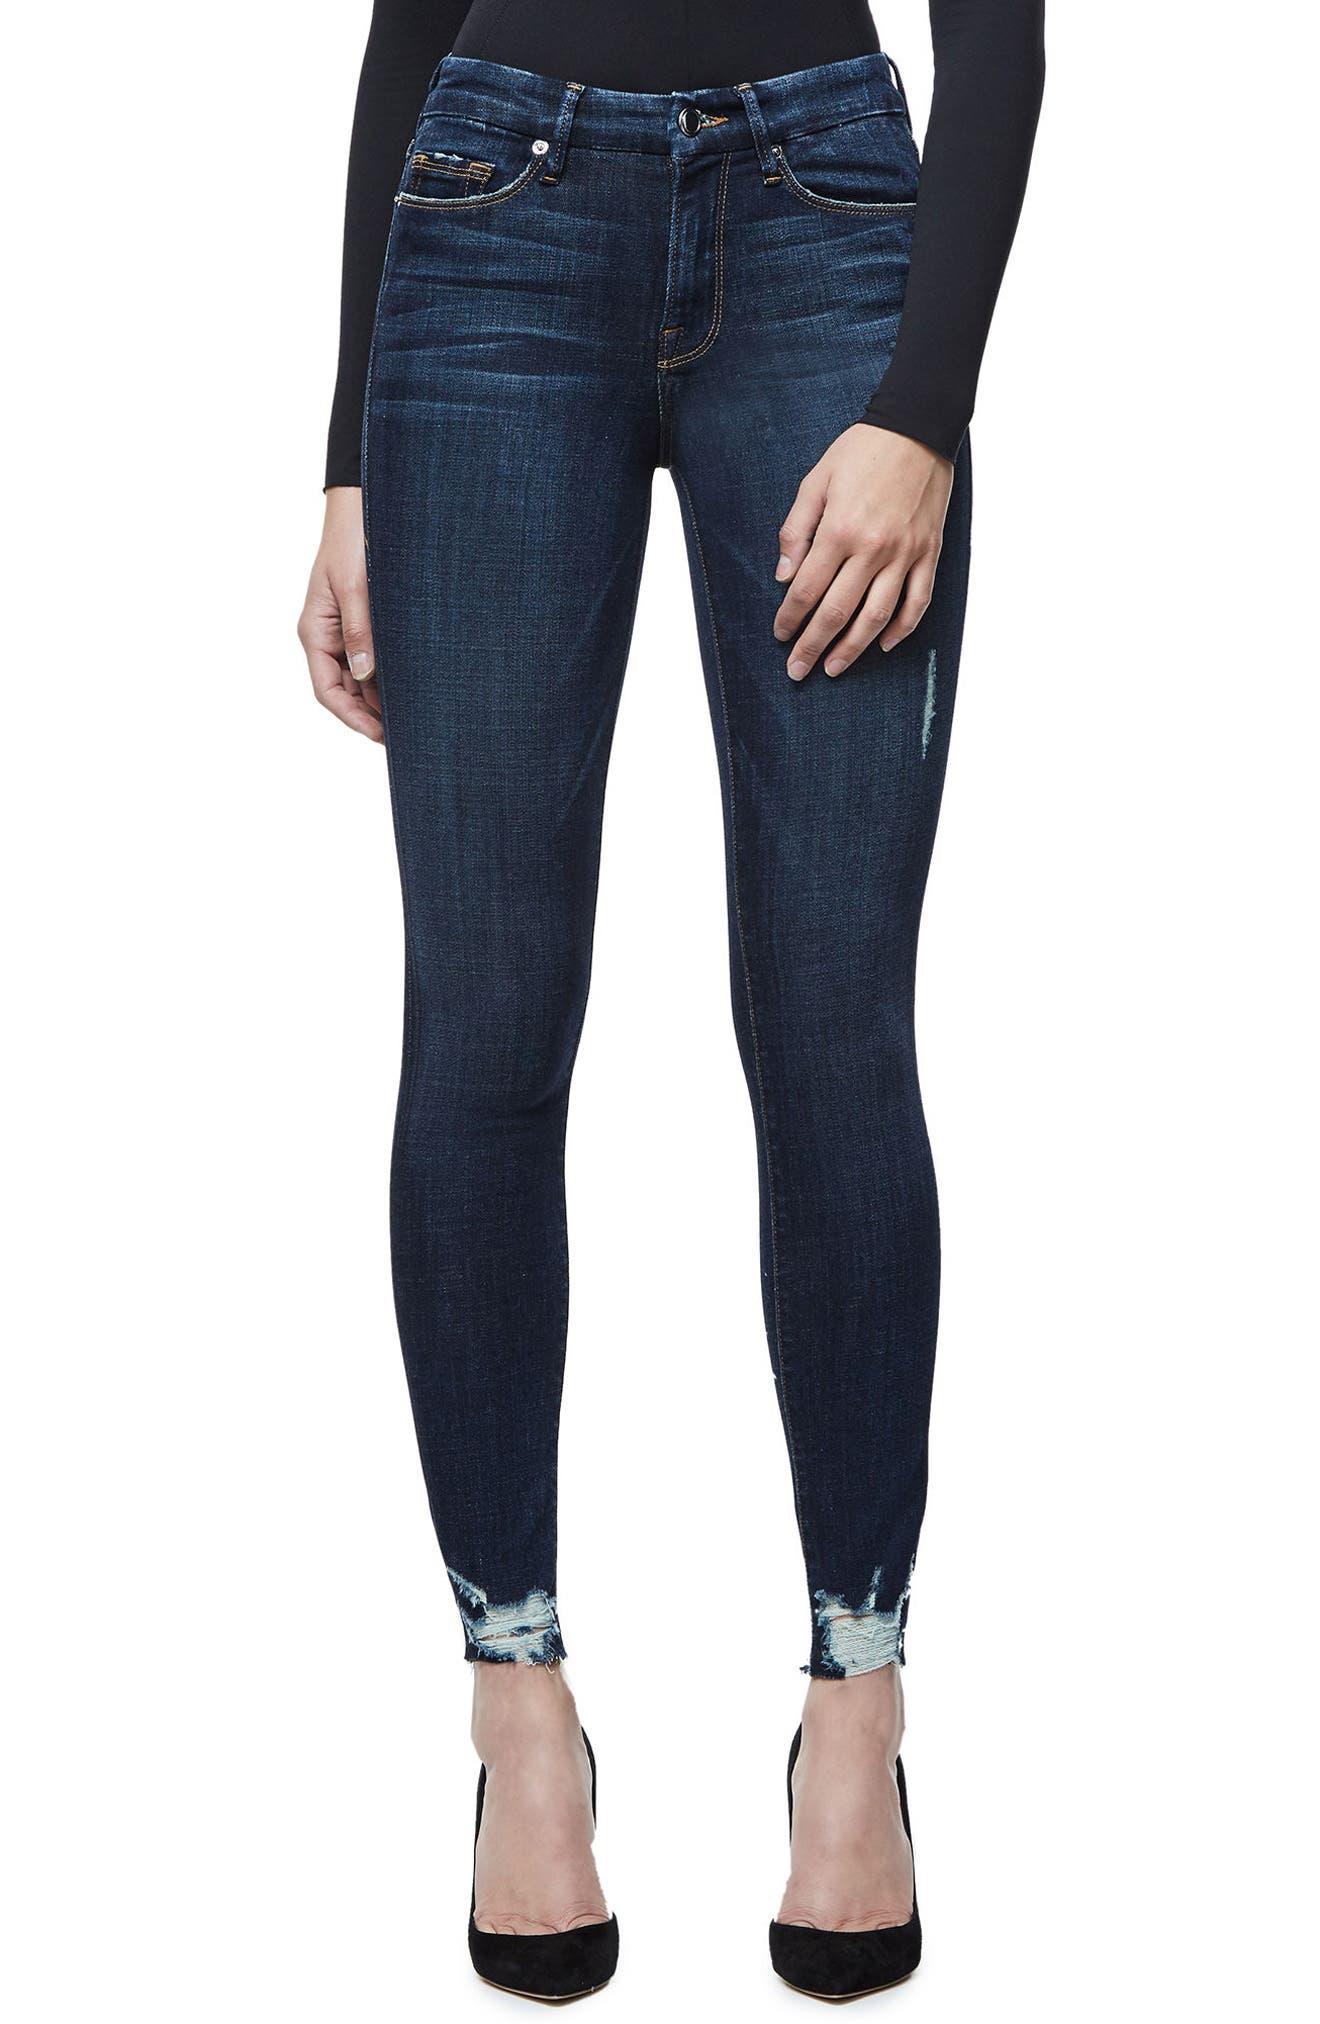 Main Image - Good American Good Legs Raw Hem Skinny Jeans (Blue 080) (Extended Sizes)